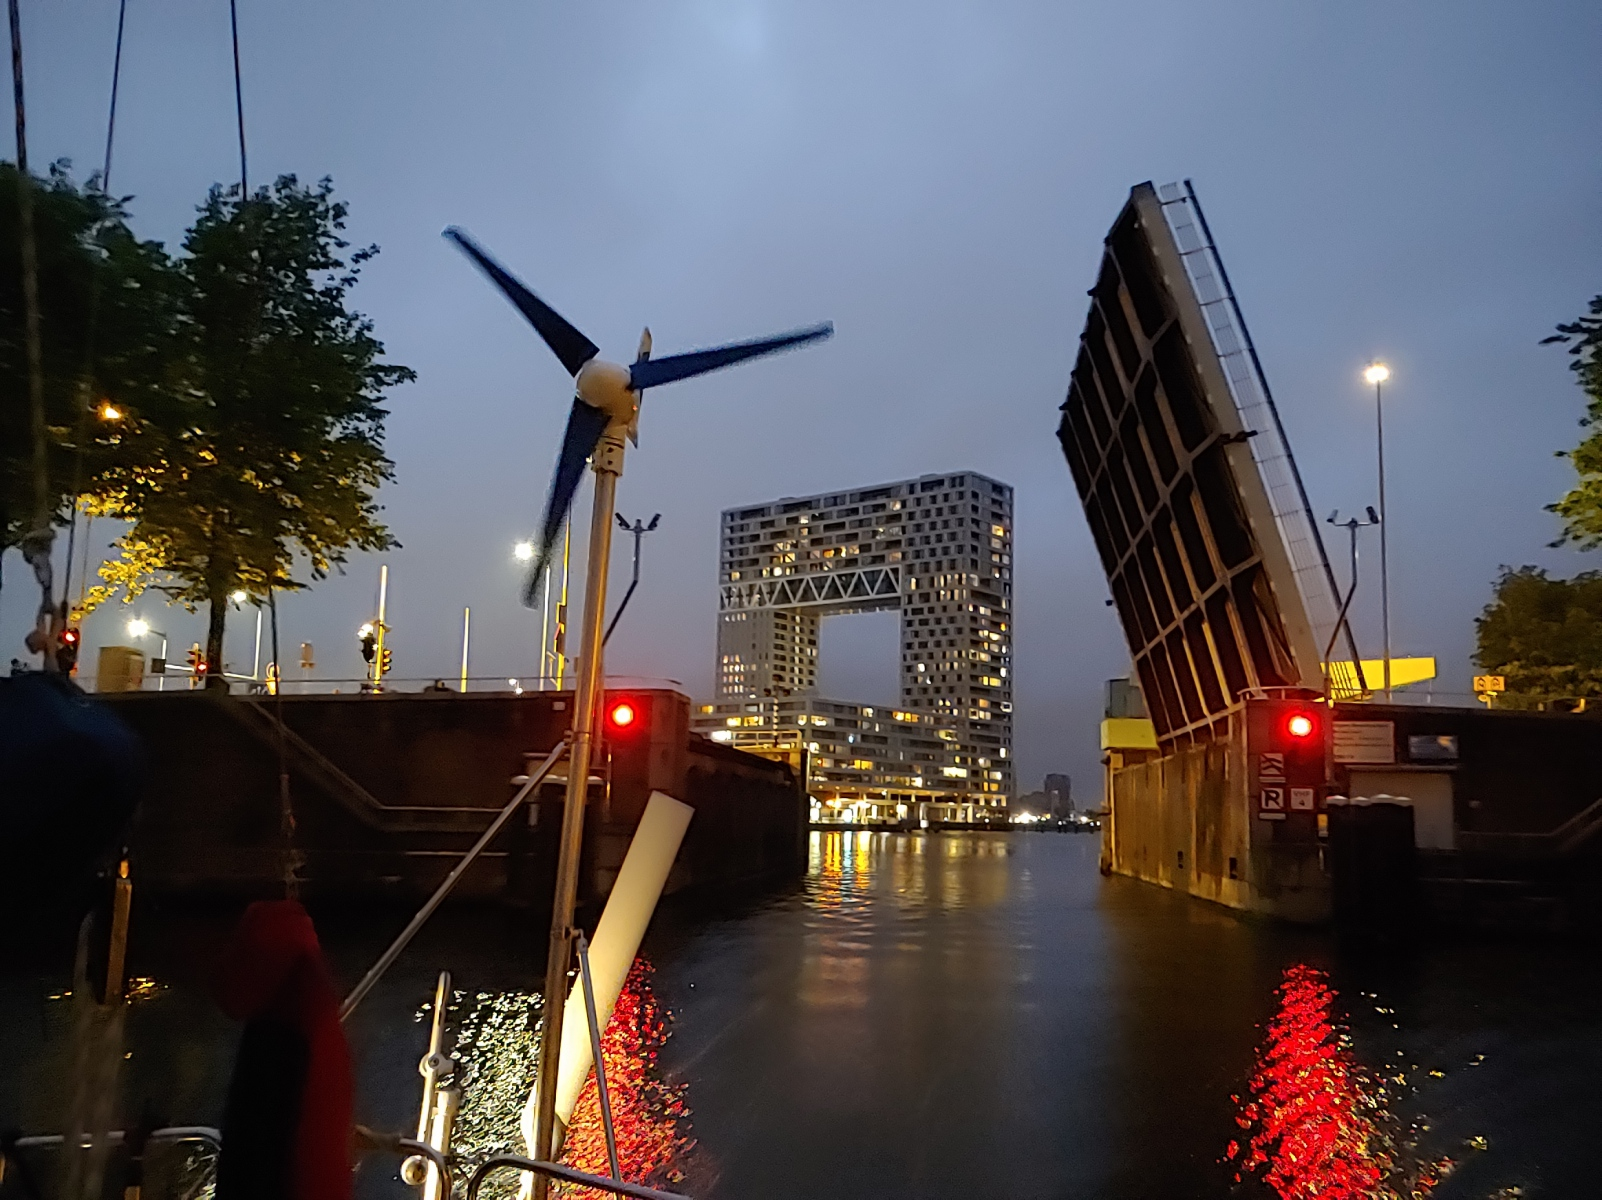 Tschüß Amsterdam!